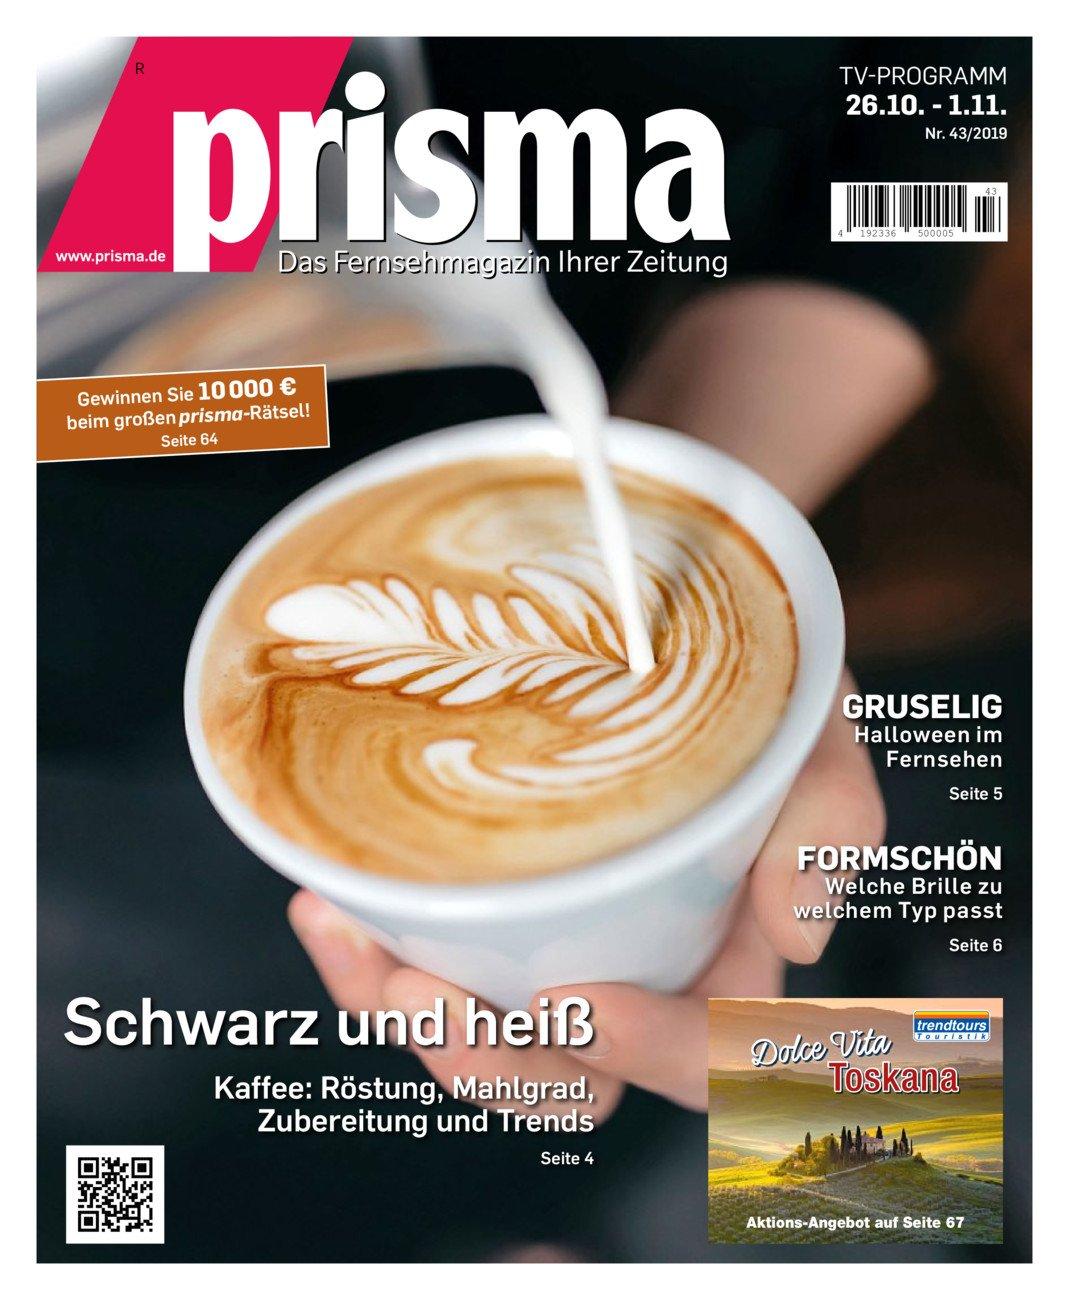 Prisma 26.10. - 01.11.